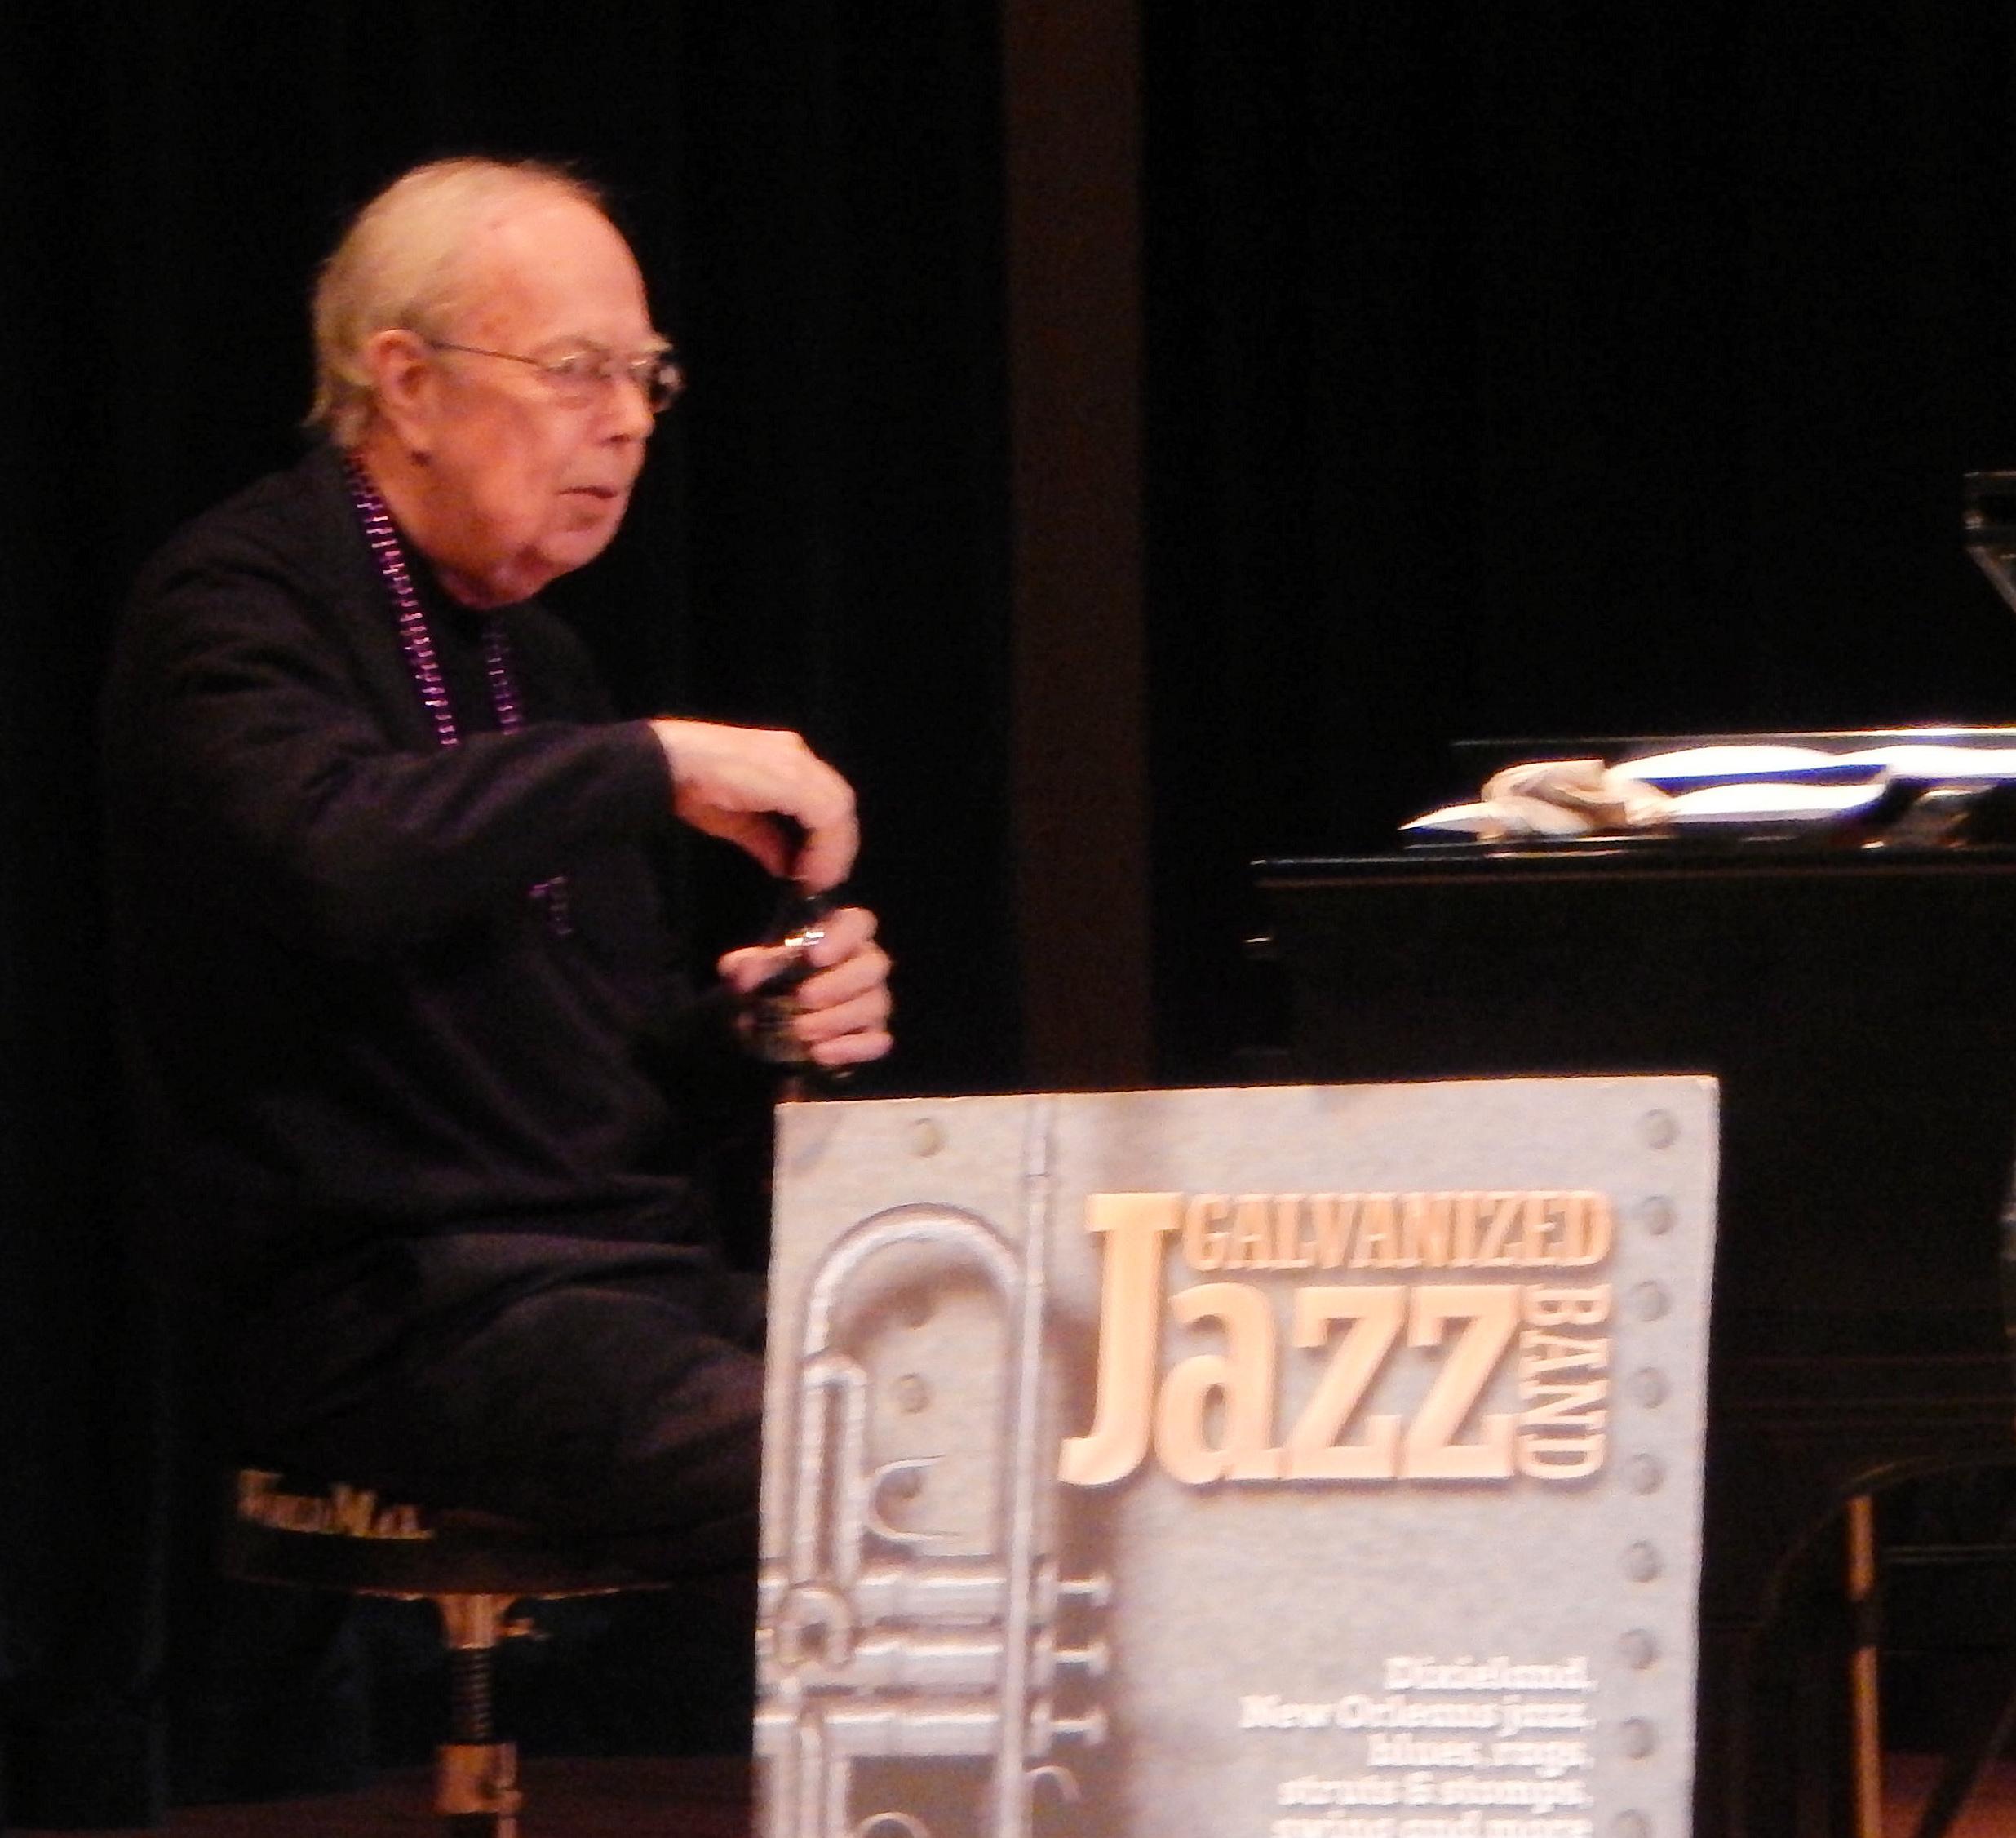 Bill Sinclair on piano